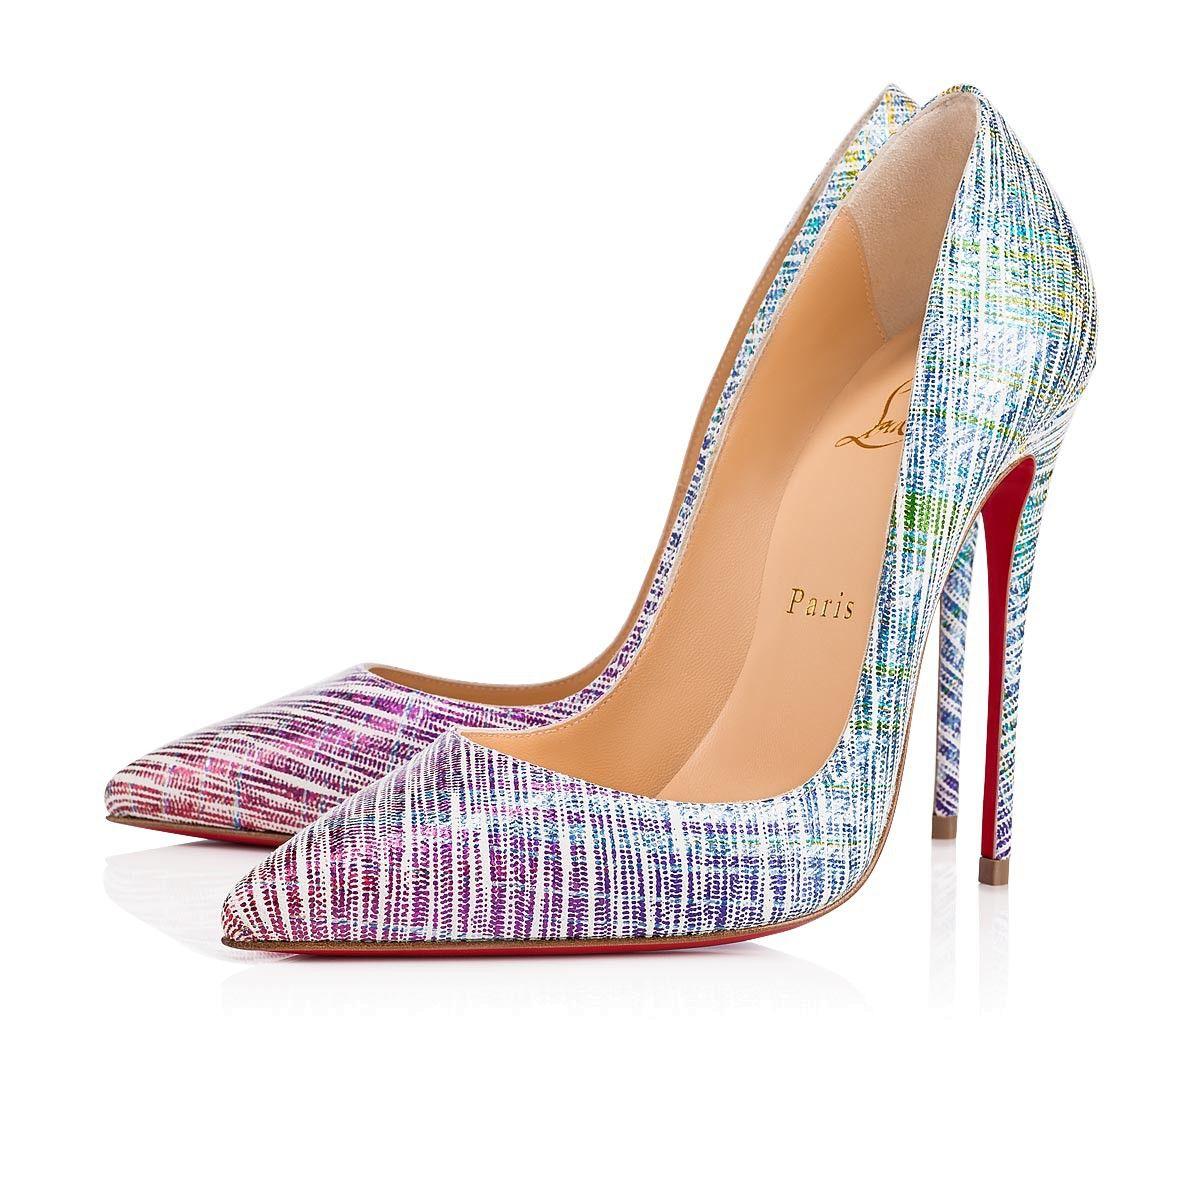 6ba46175f0b CHRISTIAN LOUBOUTIN . #christianlouboutin #shoes # | Christian ...